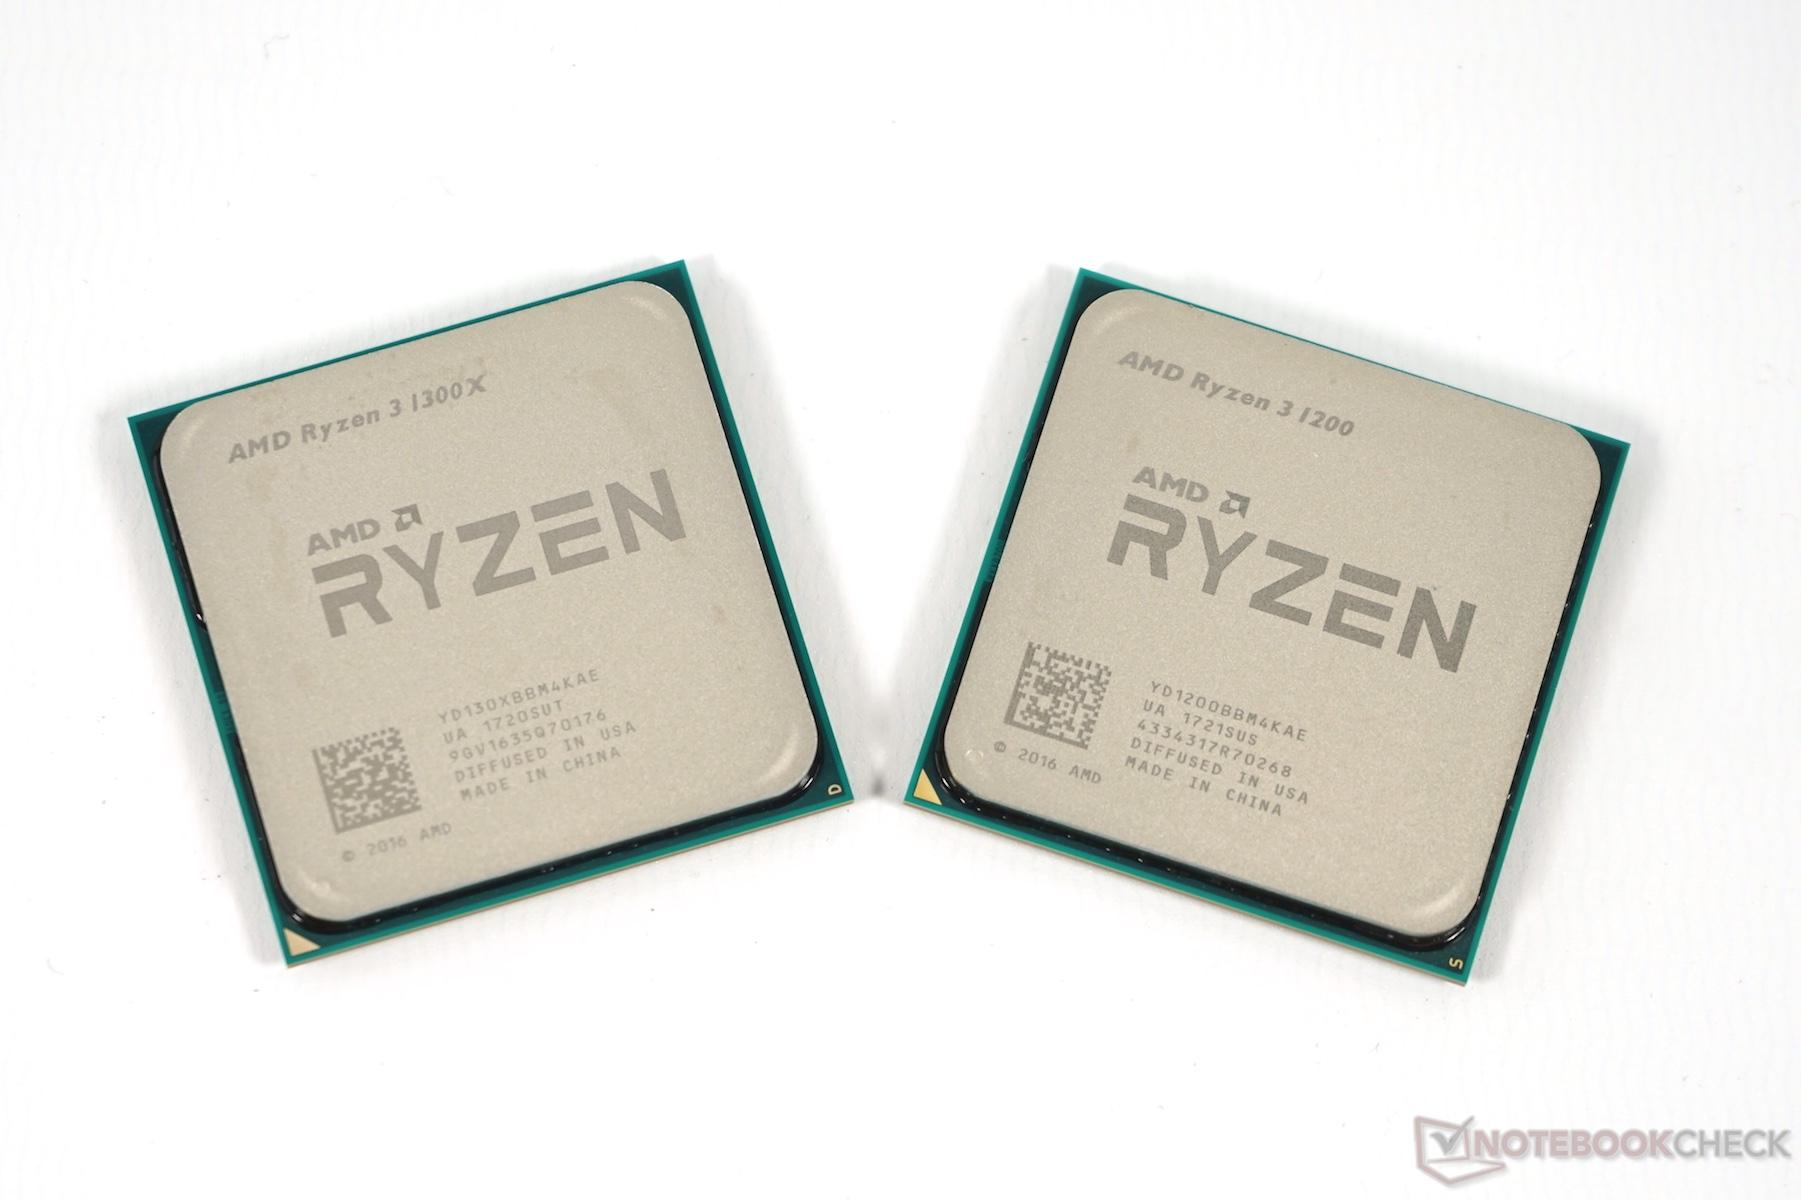 Ryzen 3 Review: 1200 and 1300X for Desktop PCs - NotebookCheck.net Reviews